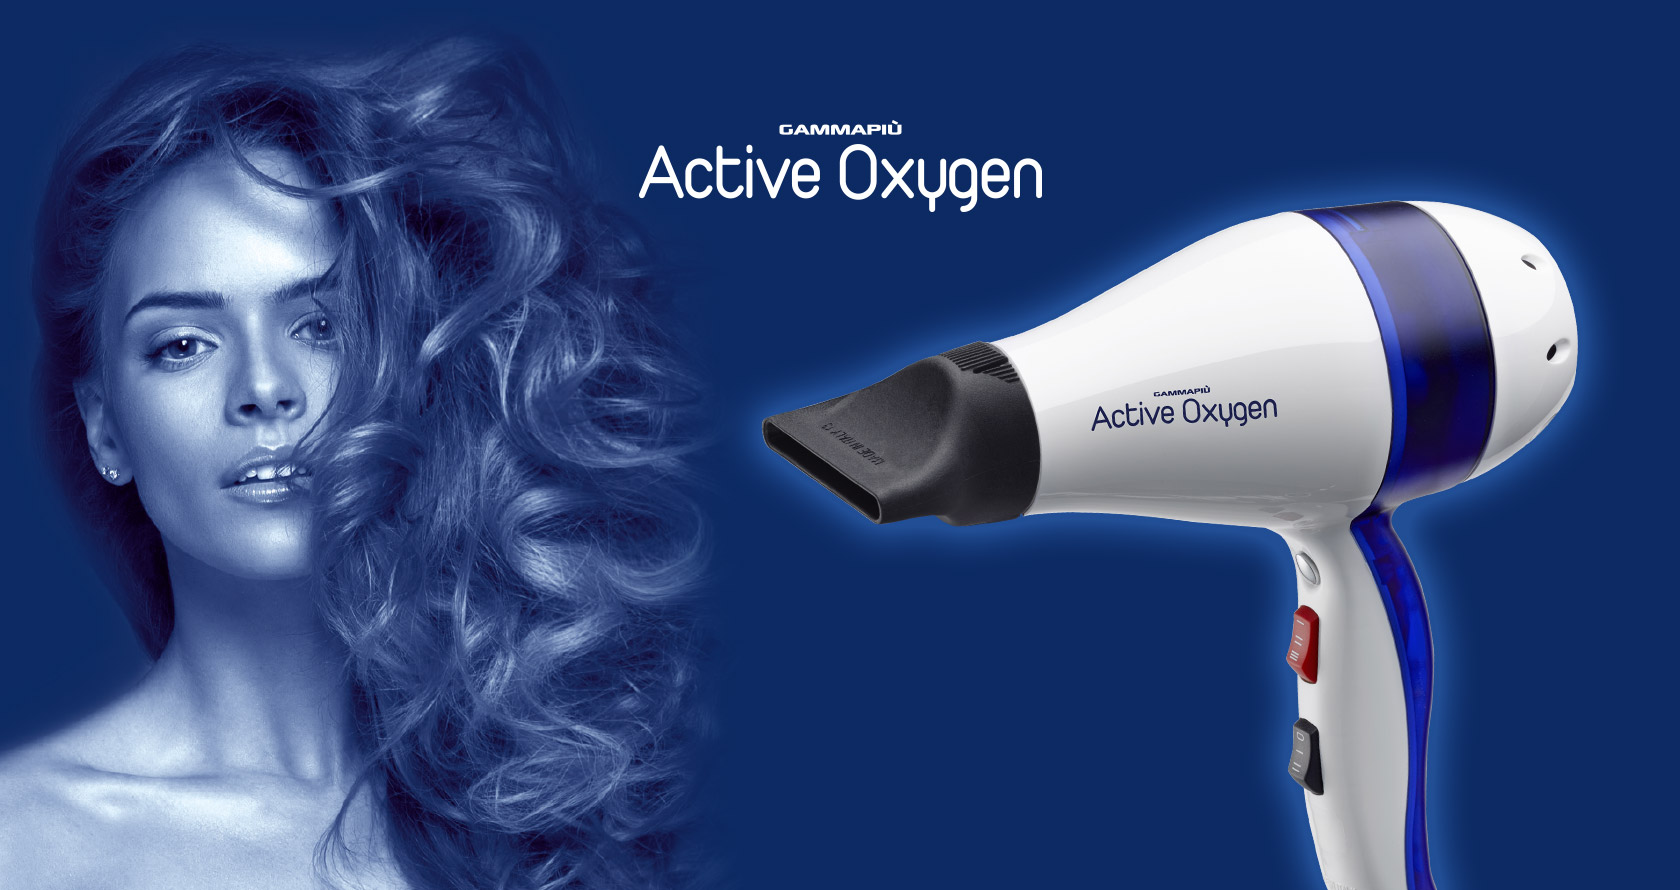 ACTIVE OXYGEN